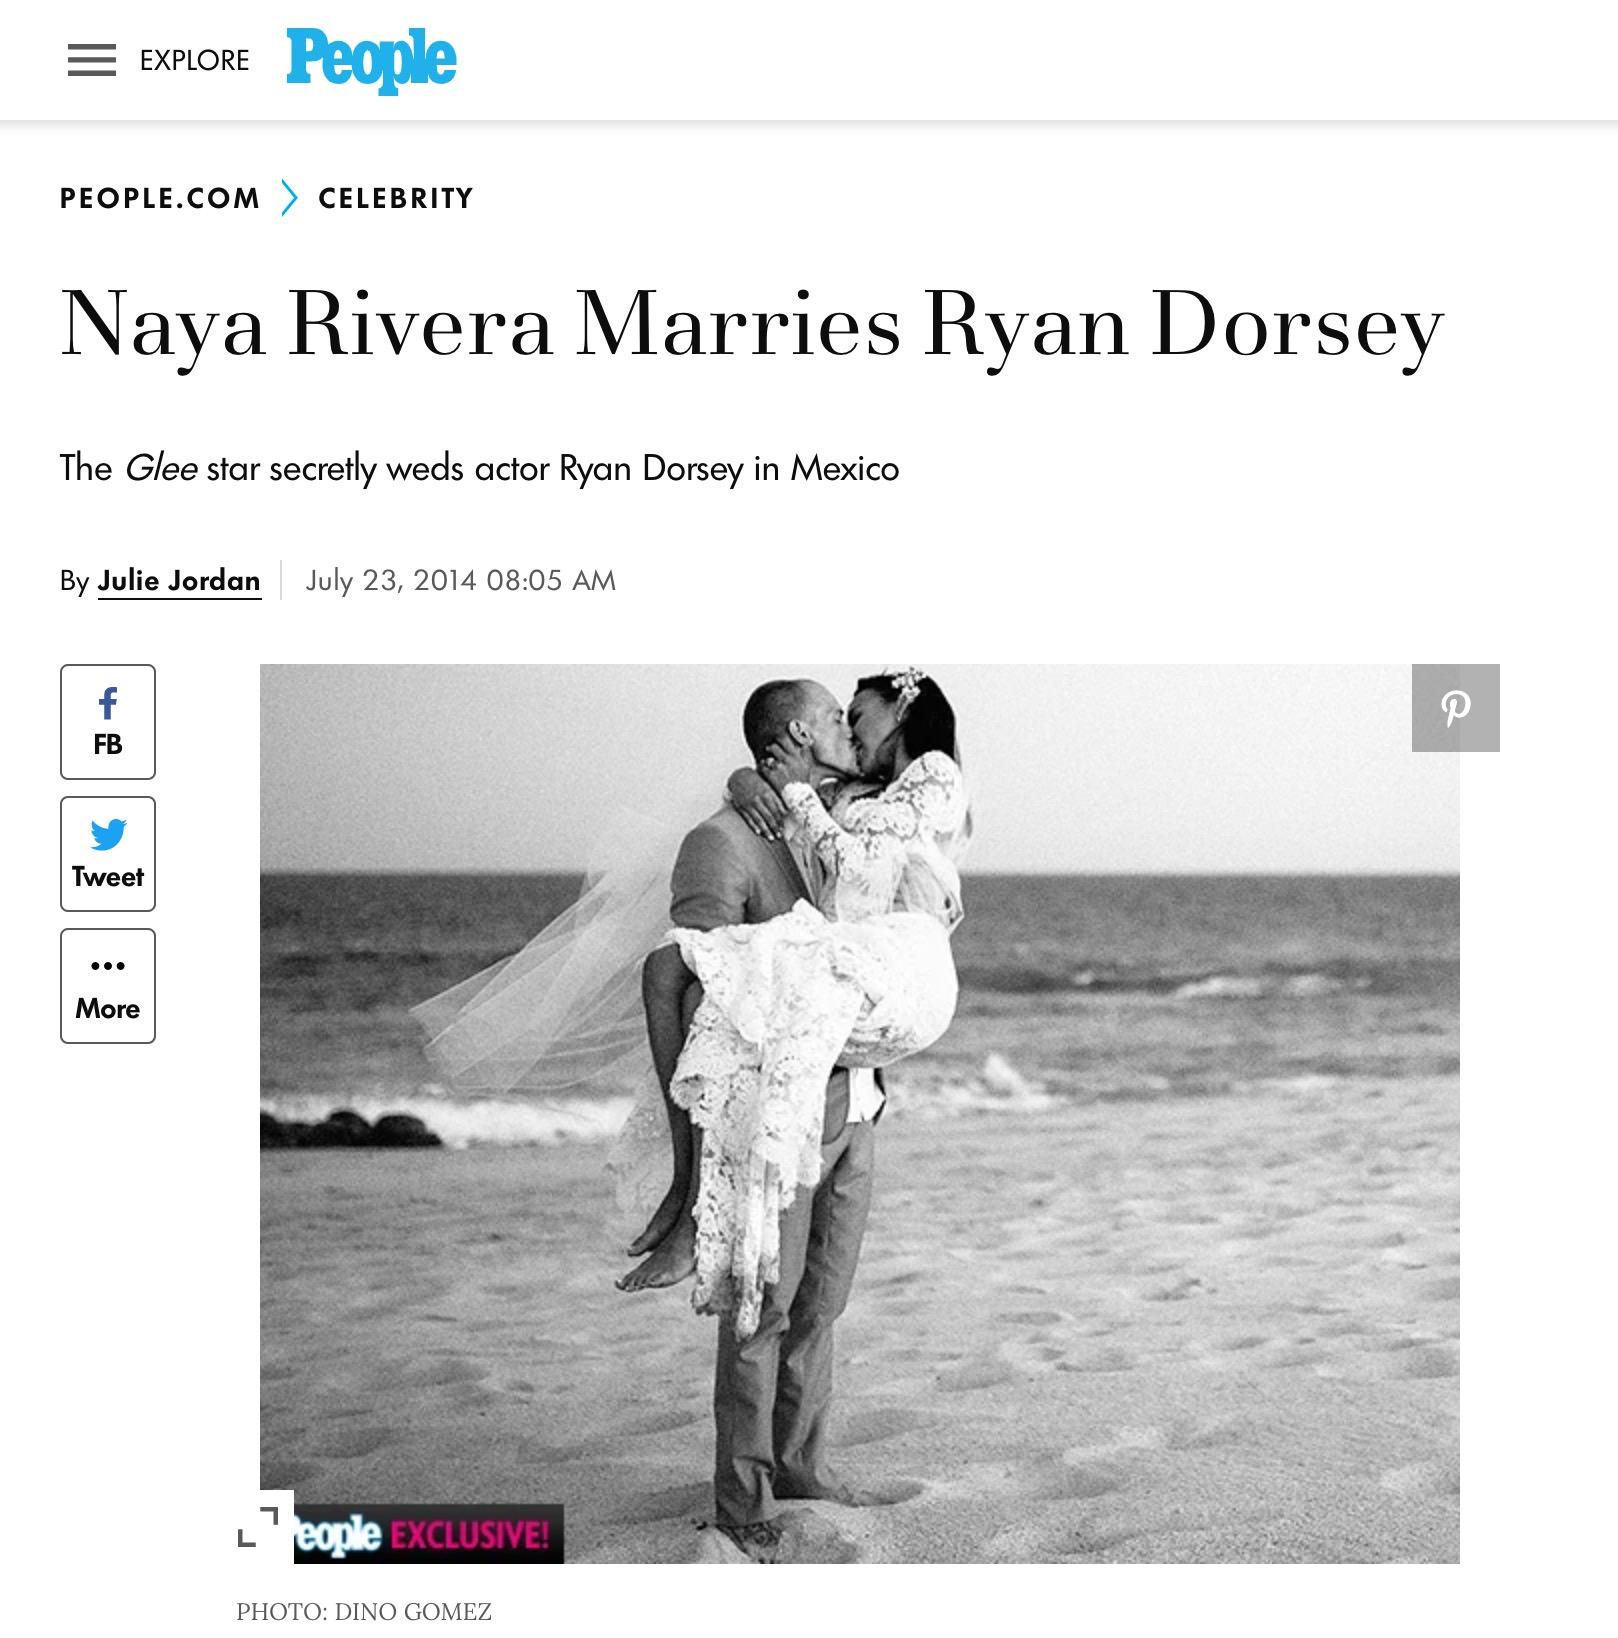 Naya Rivera People Article